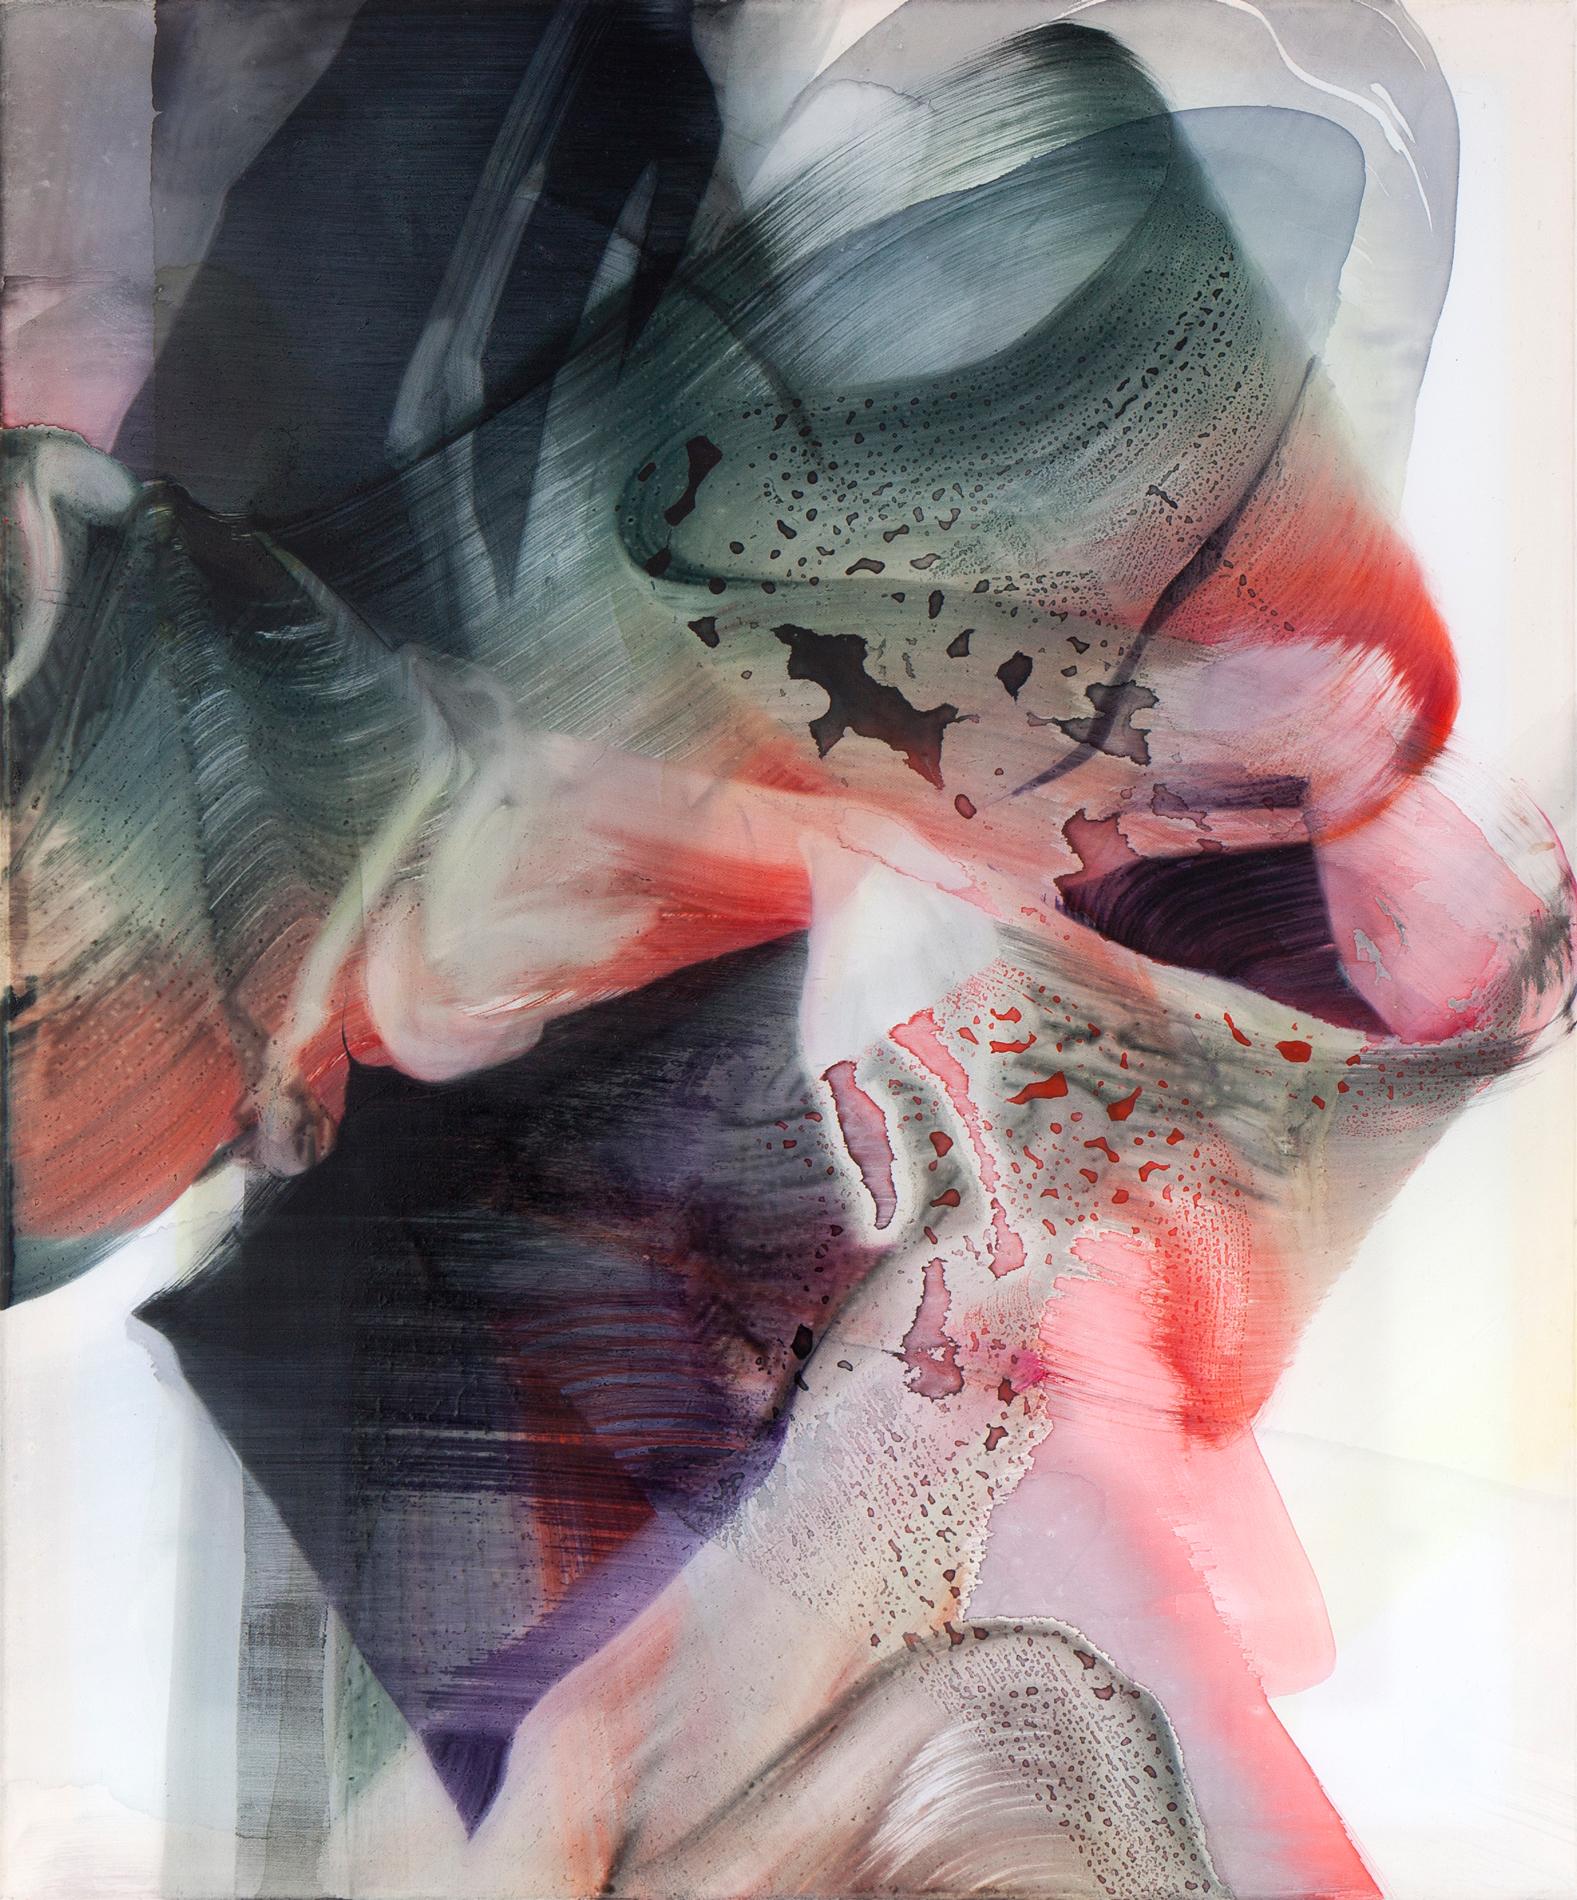 © Natascha Schmitten, Glance I, 60 x 50 cm, ink, oil on nylon, 2017